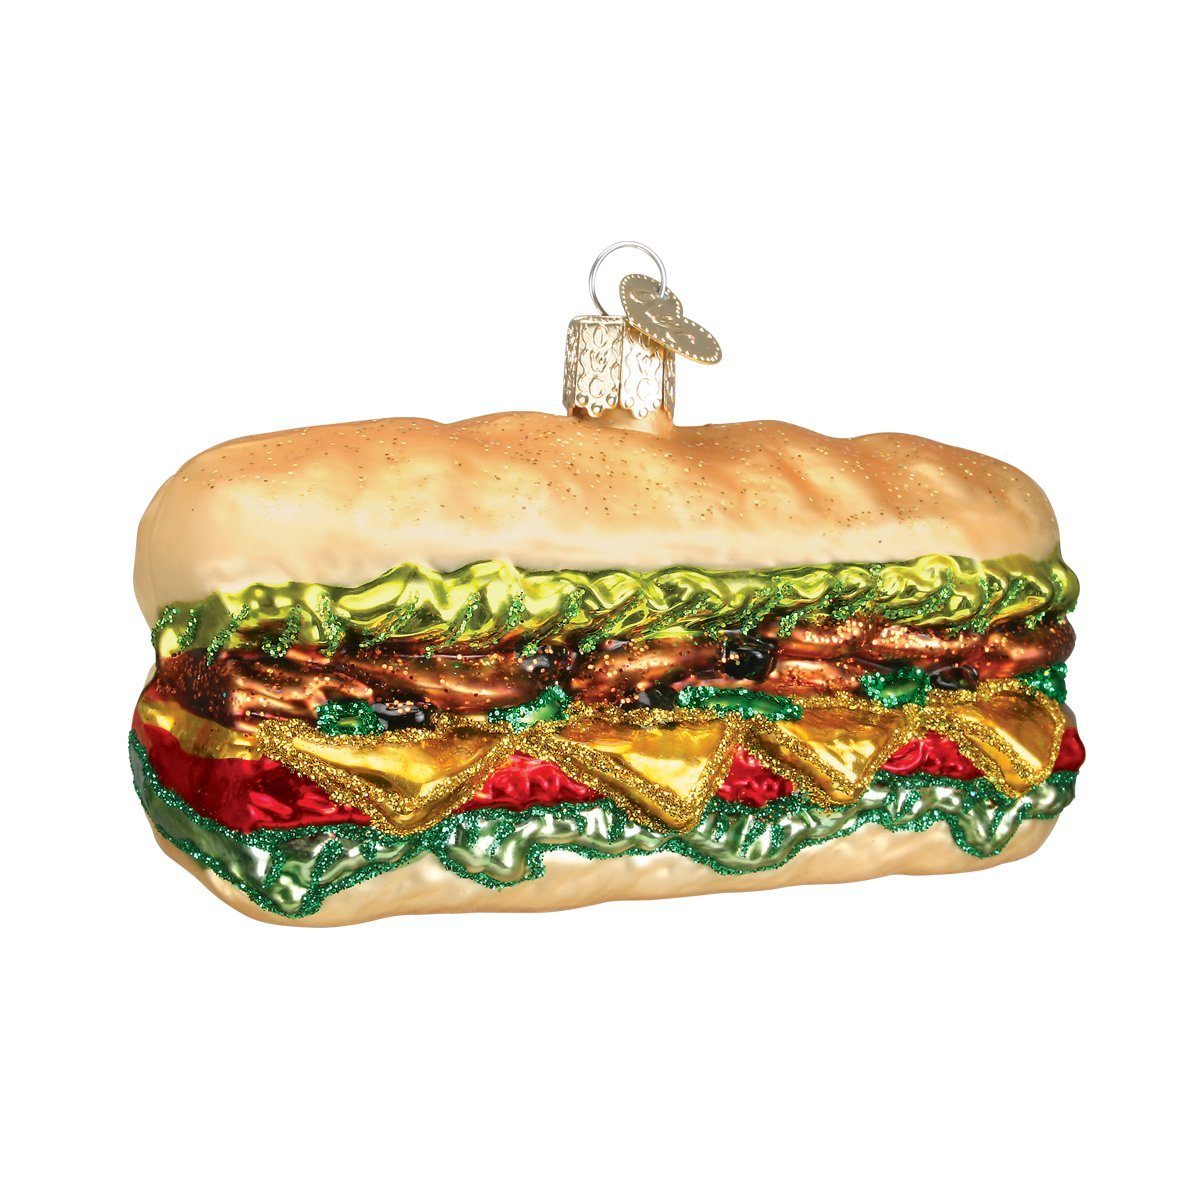 Old World Christmas Deli Sandwich Glass Blown Ornament